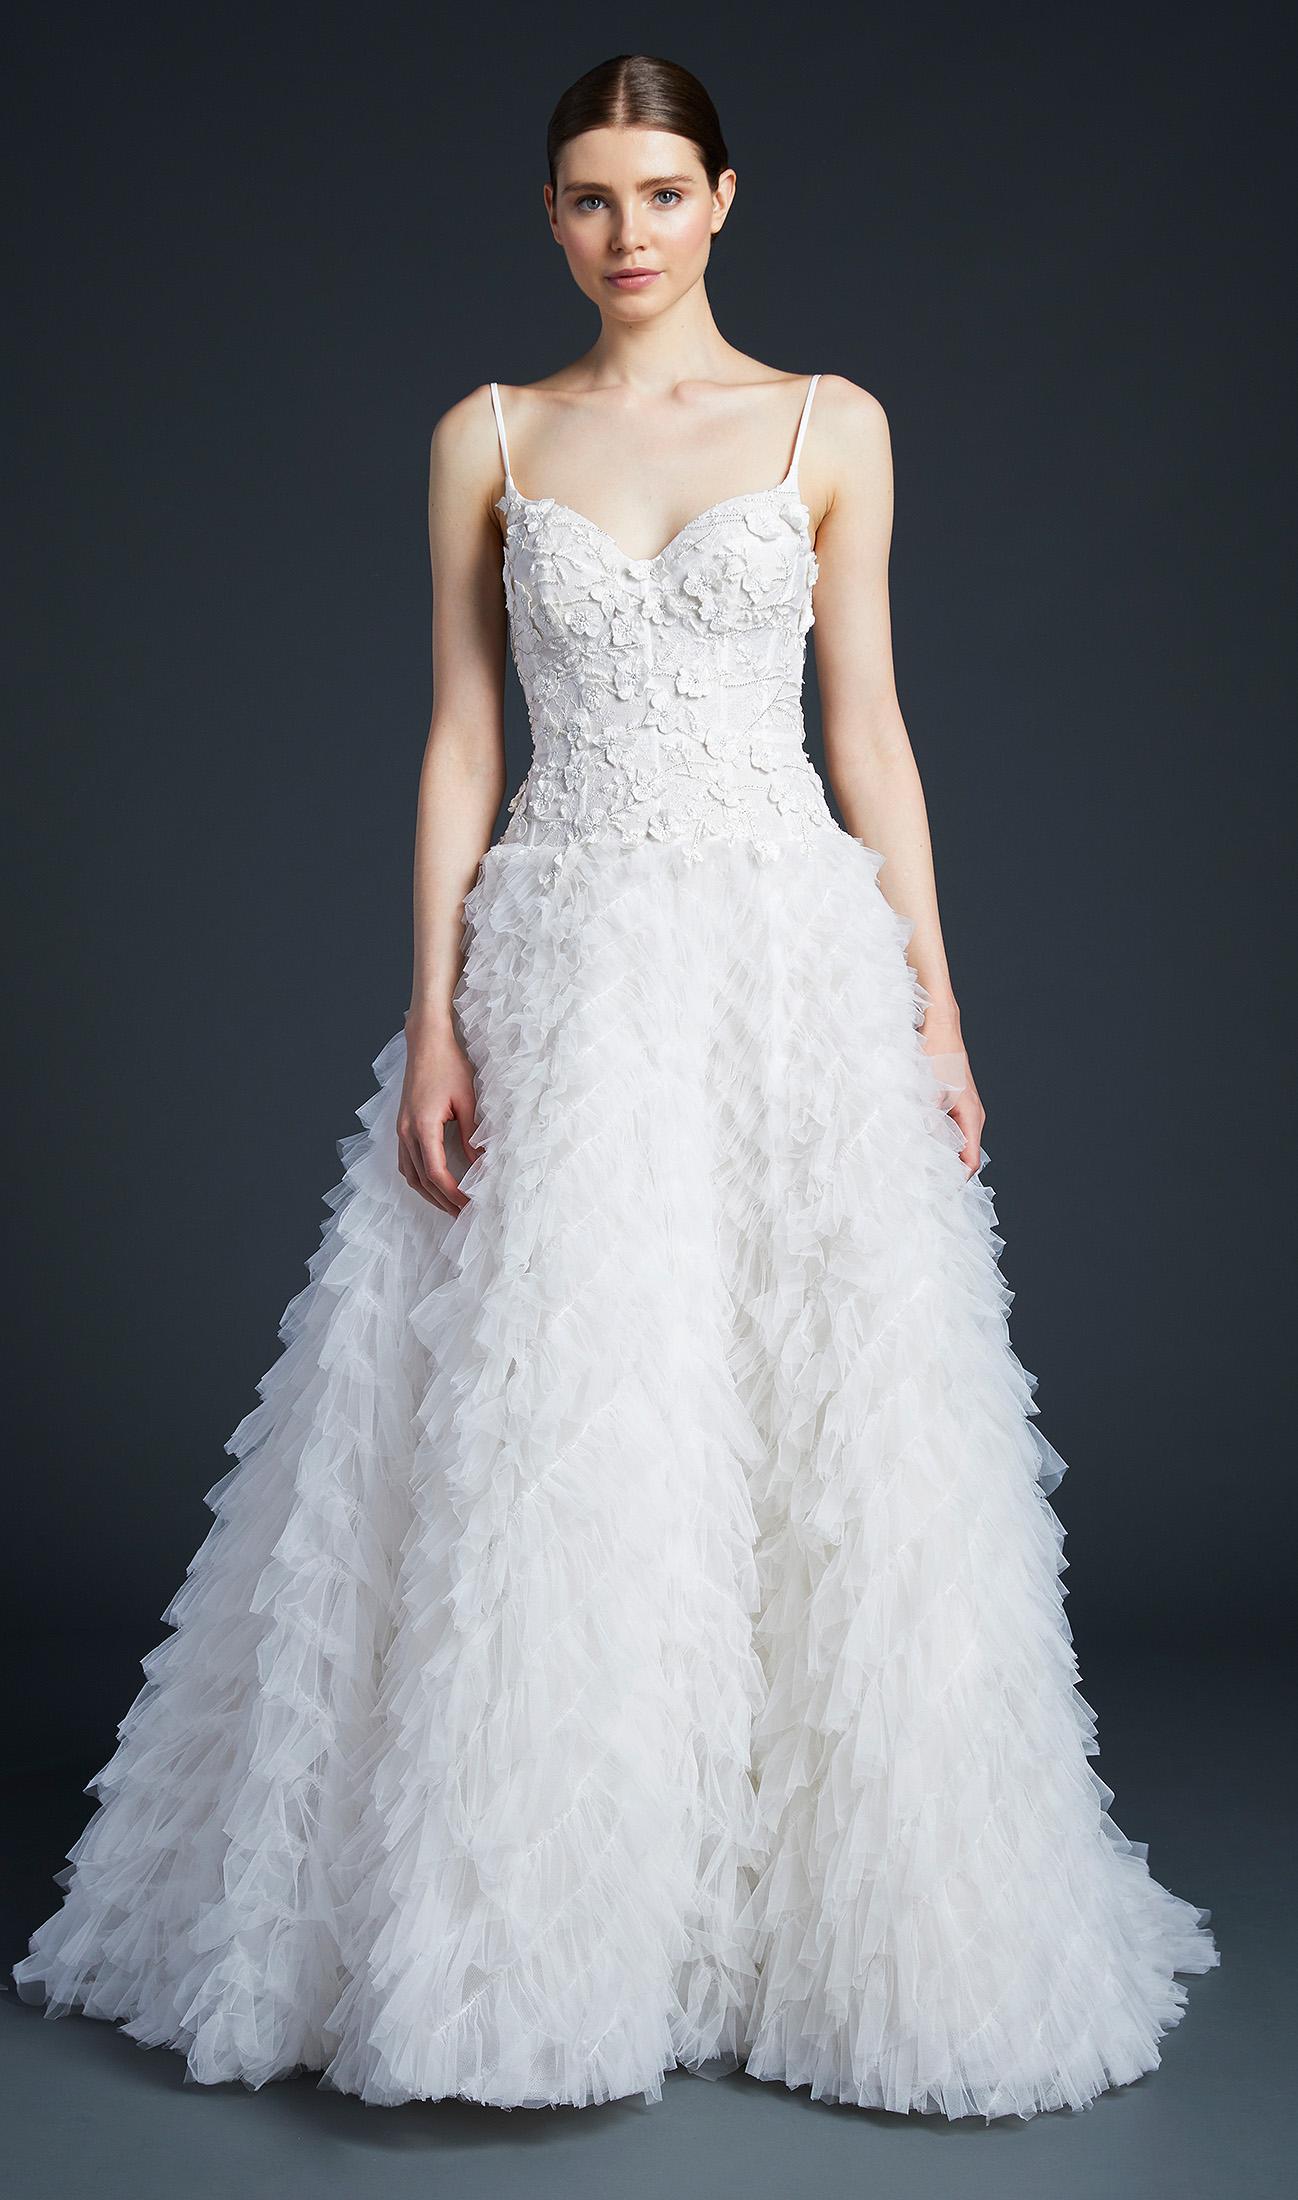 anne barge spaghetti strap feathers wedding dress fall 2019